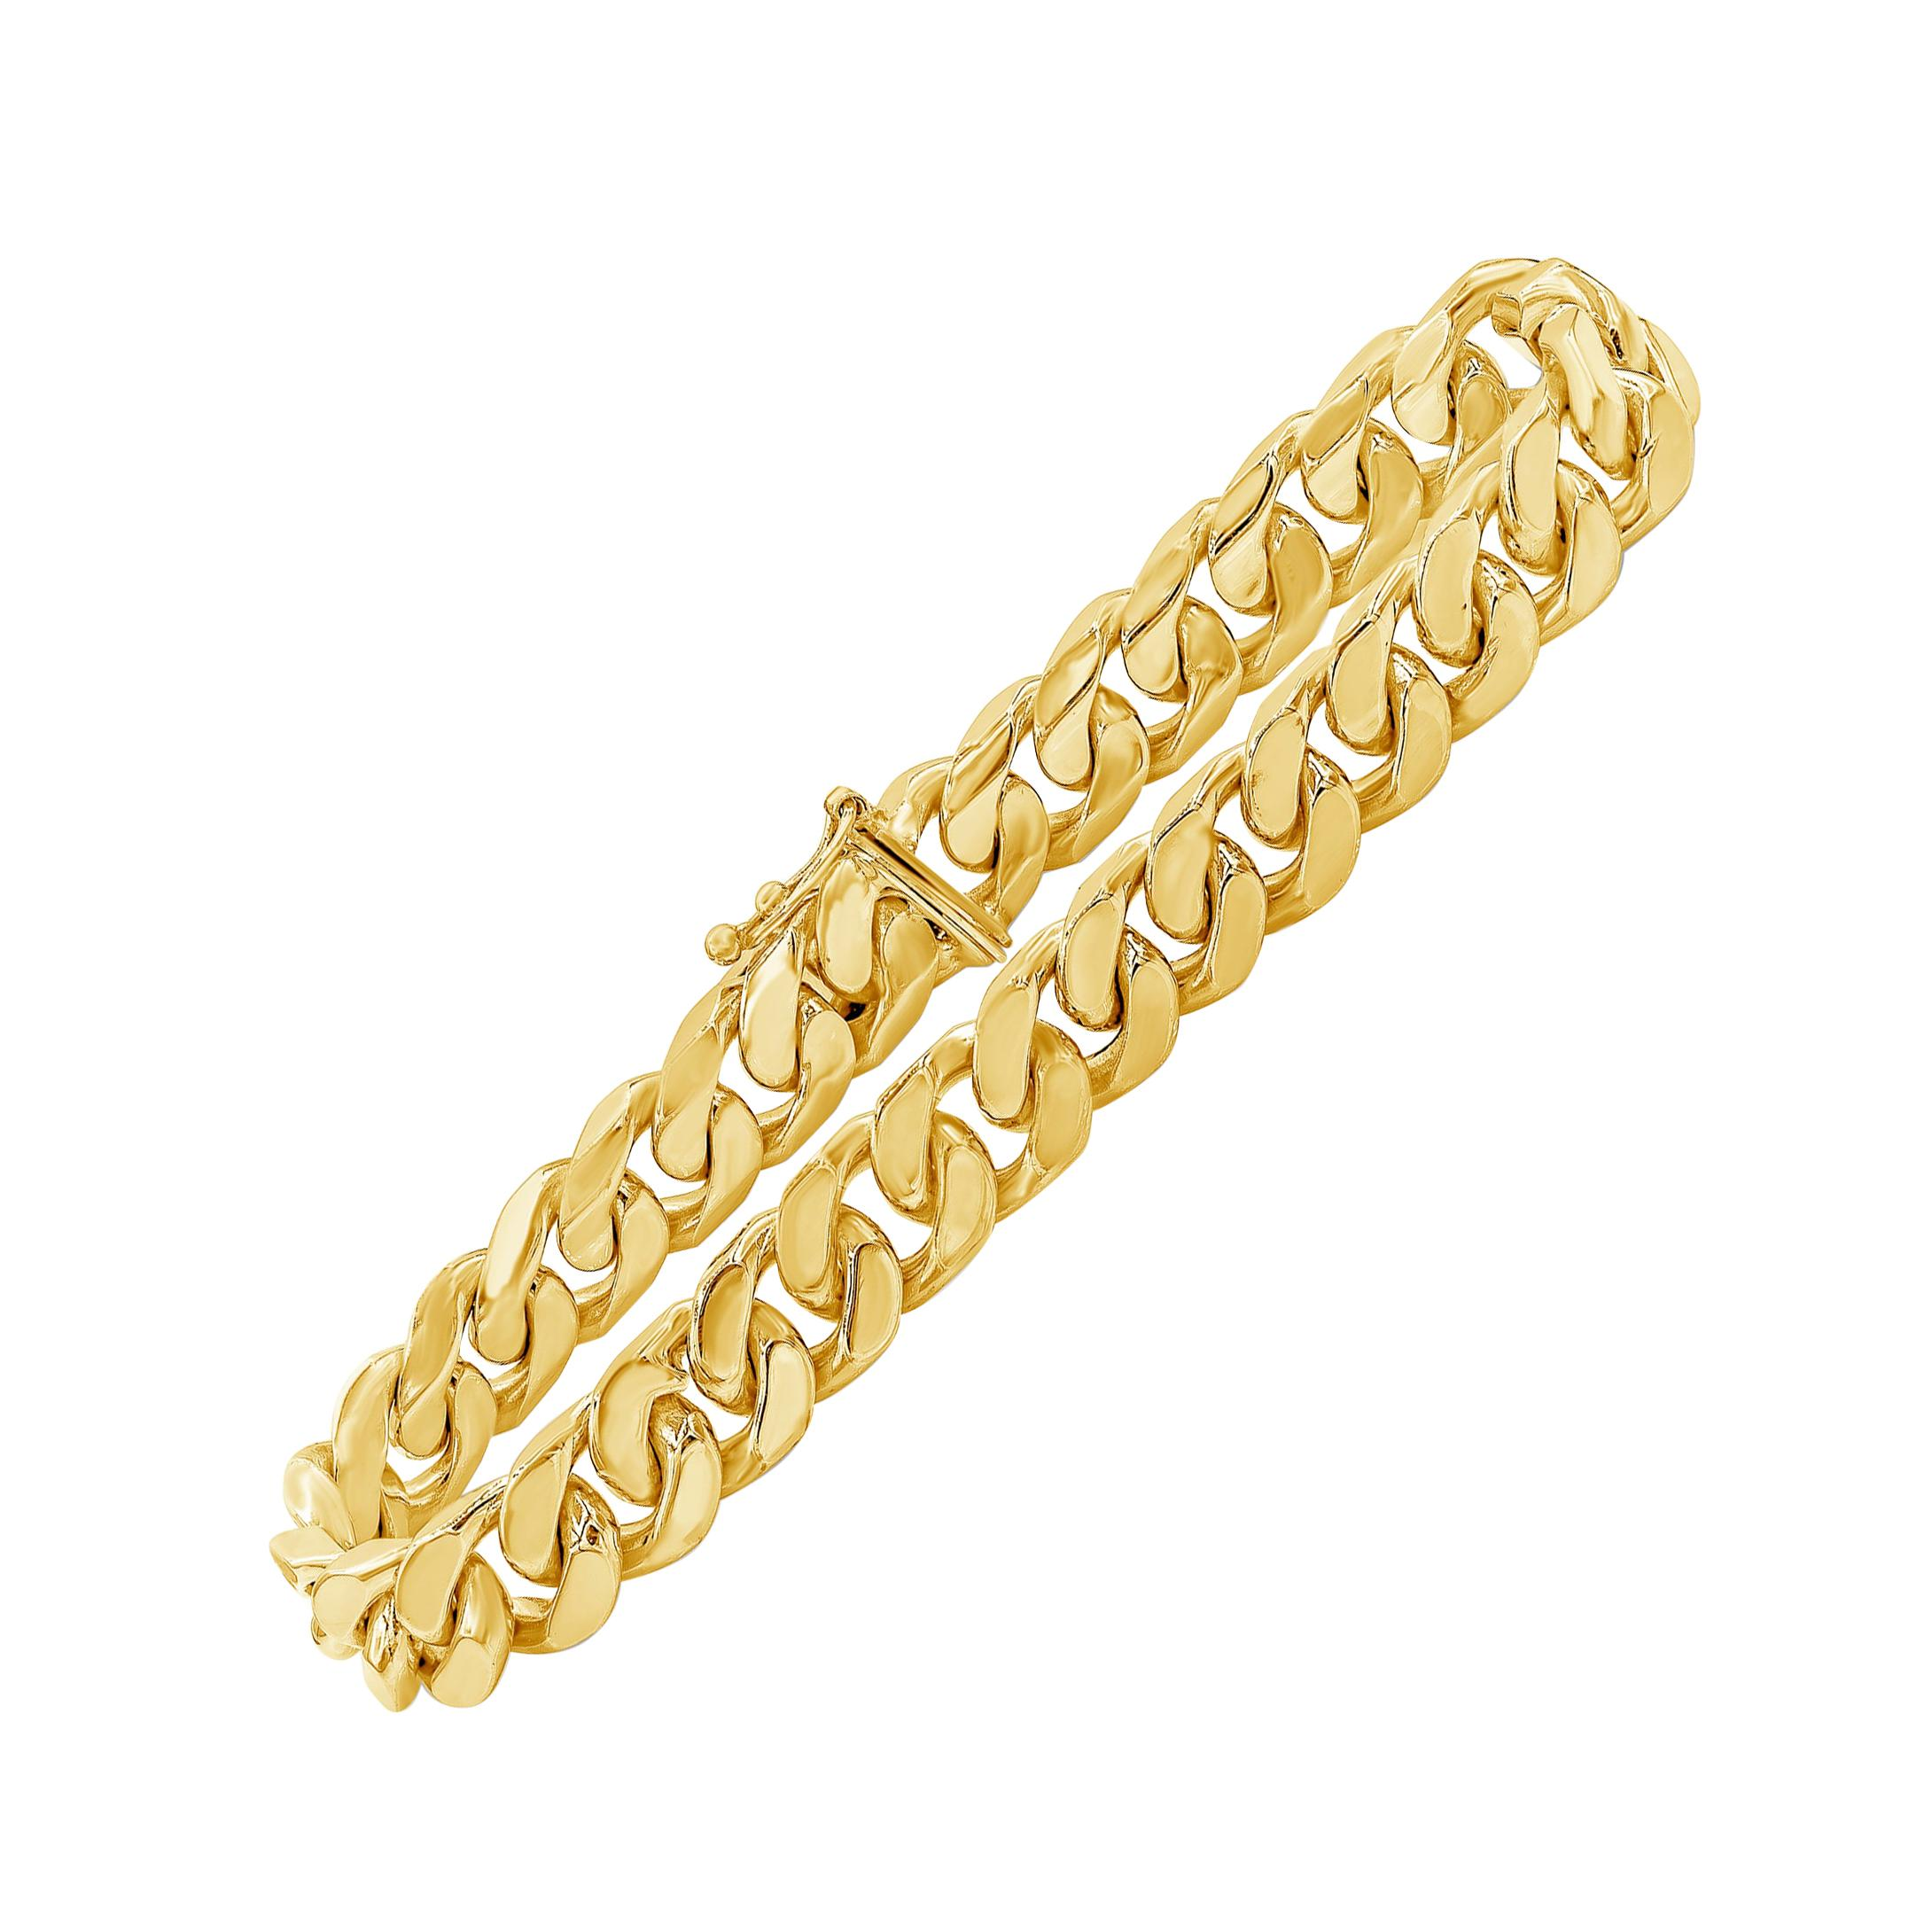 14 Karat Yellow Gold Cuban Link Chain Bracelet